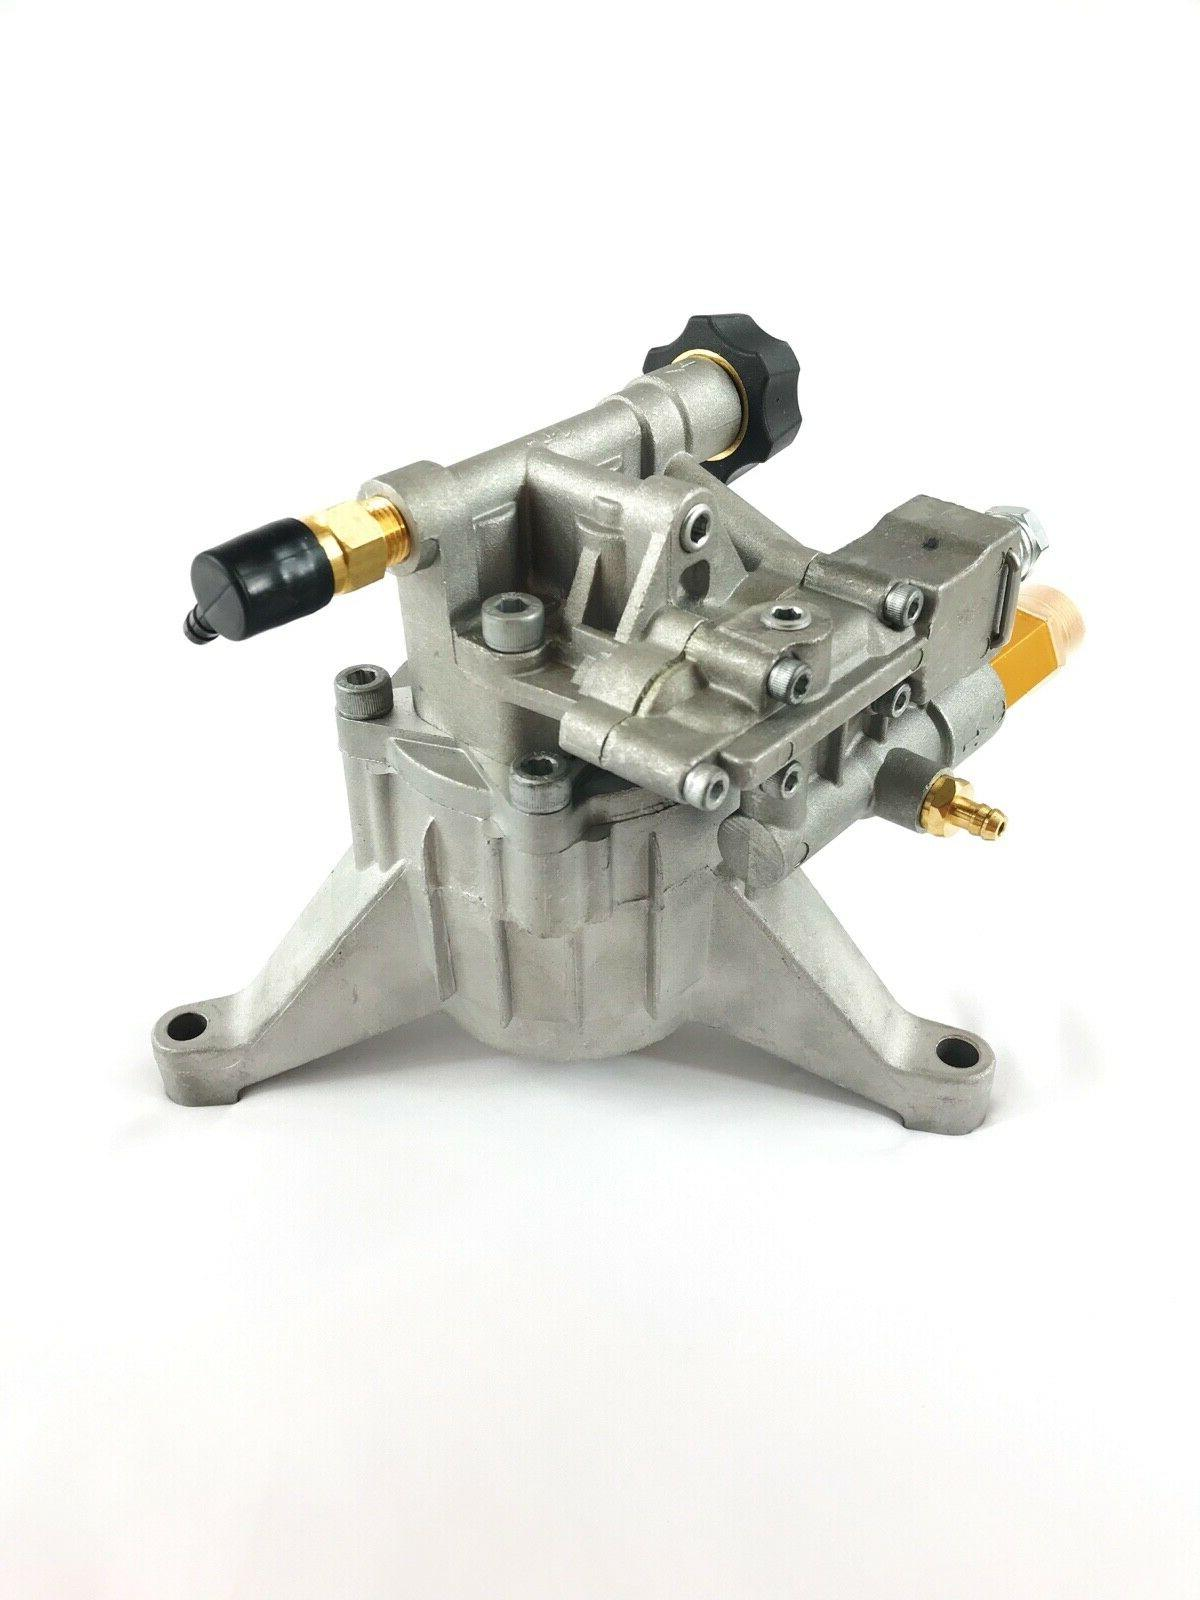 2800 Aluminum Gasoline Cold Pressure pump 2.5 GPM,